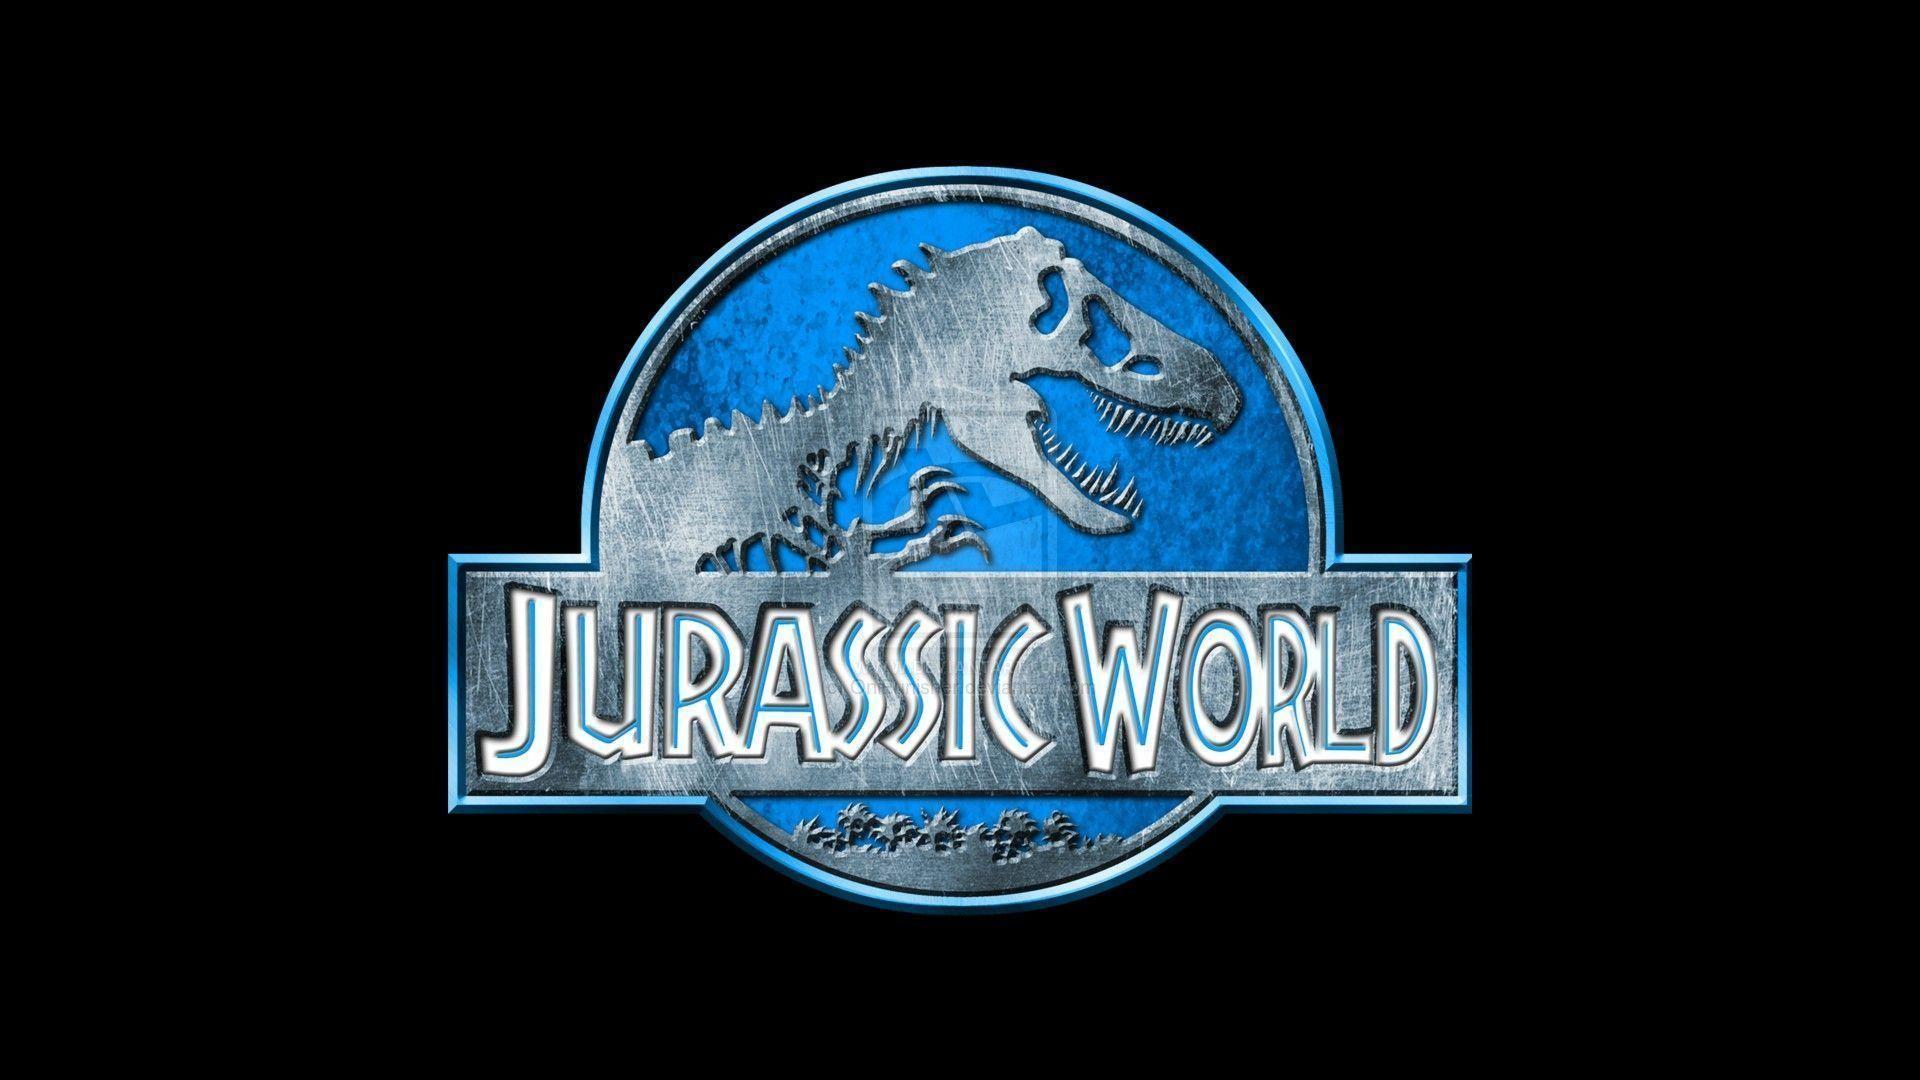 High Resolution Jurassic World Widescreen Wallpapers Full Size